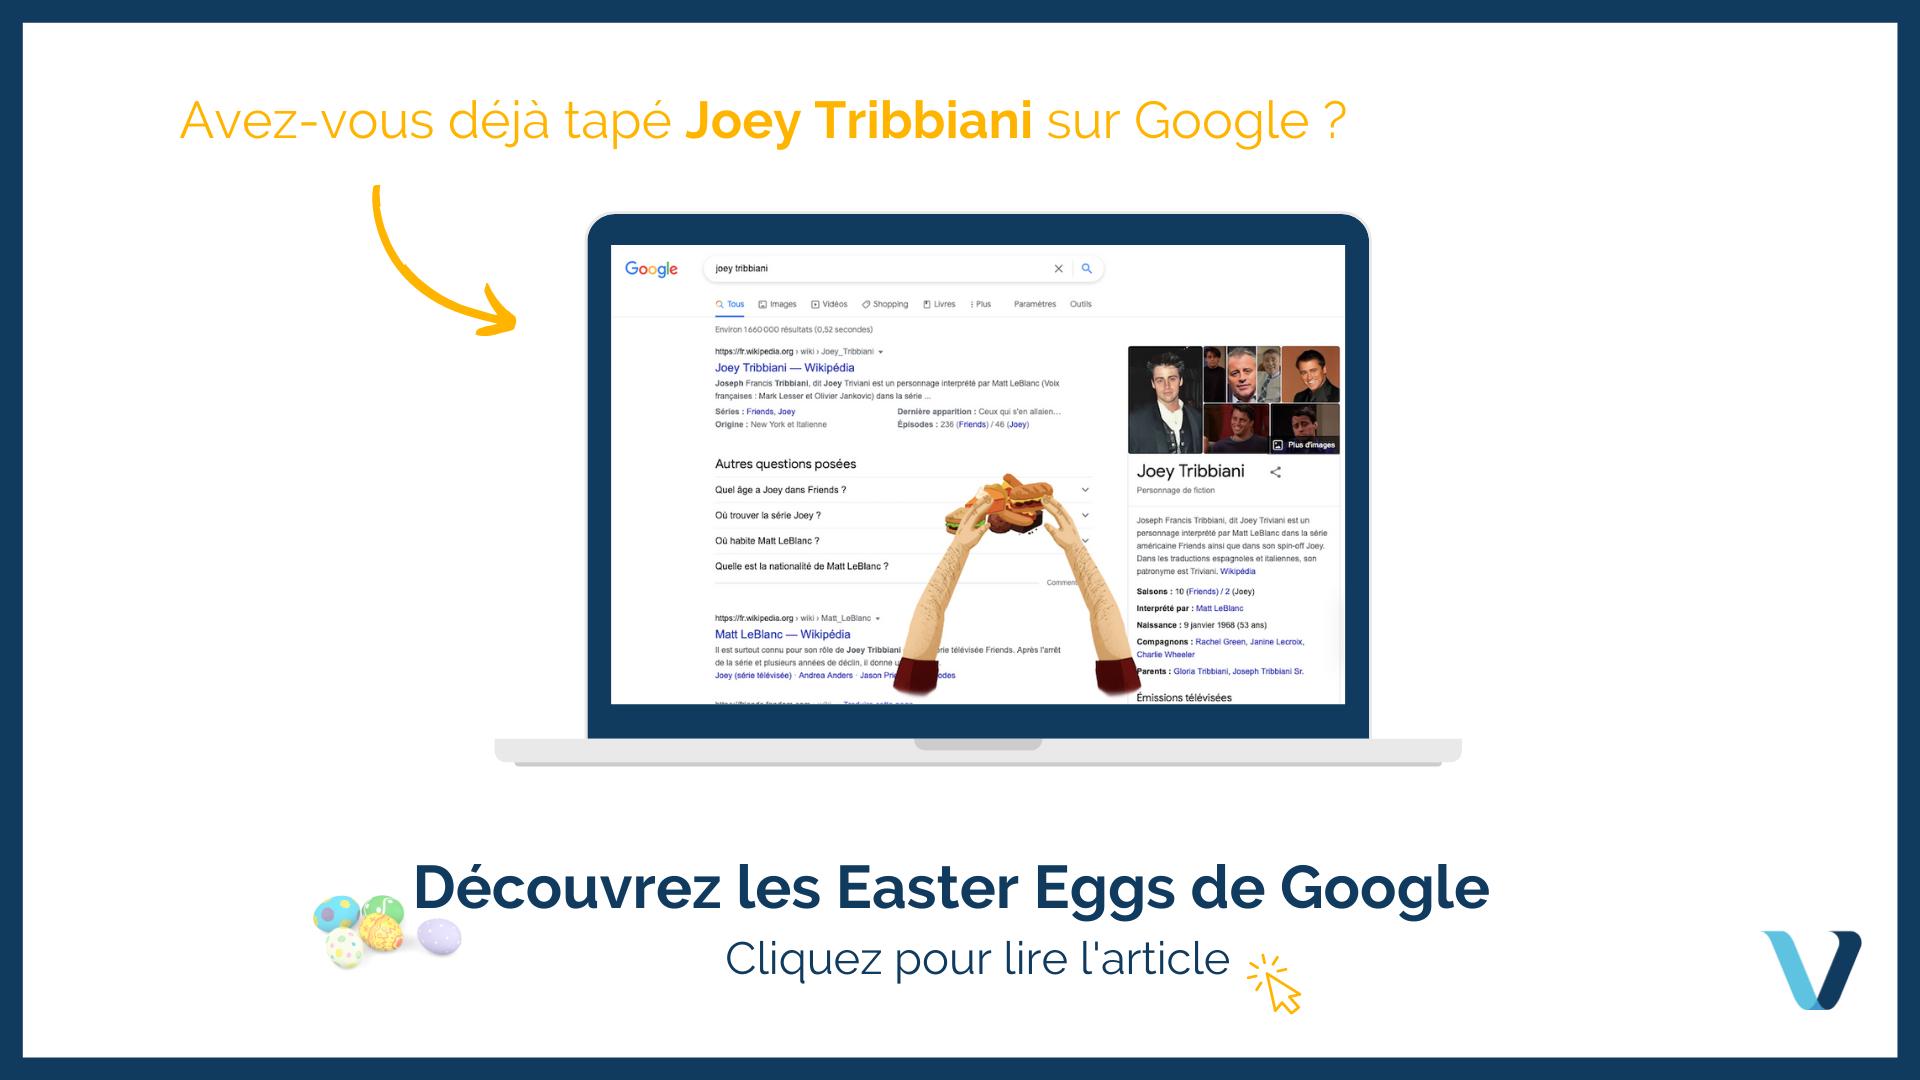 Easter egg, origines et explications